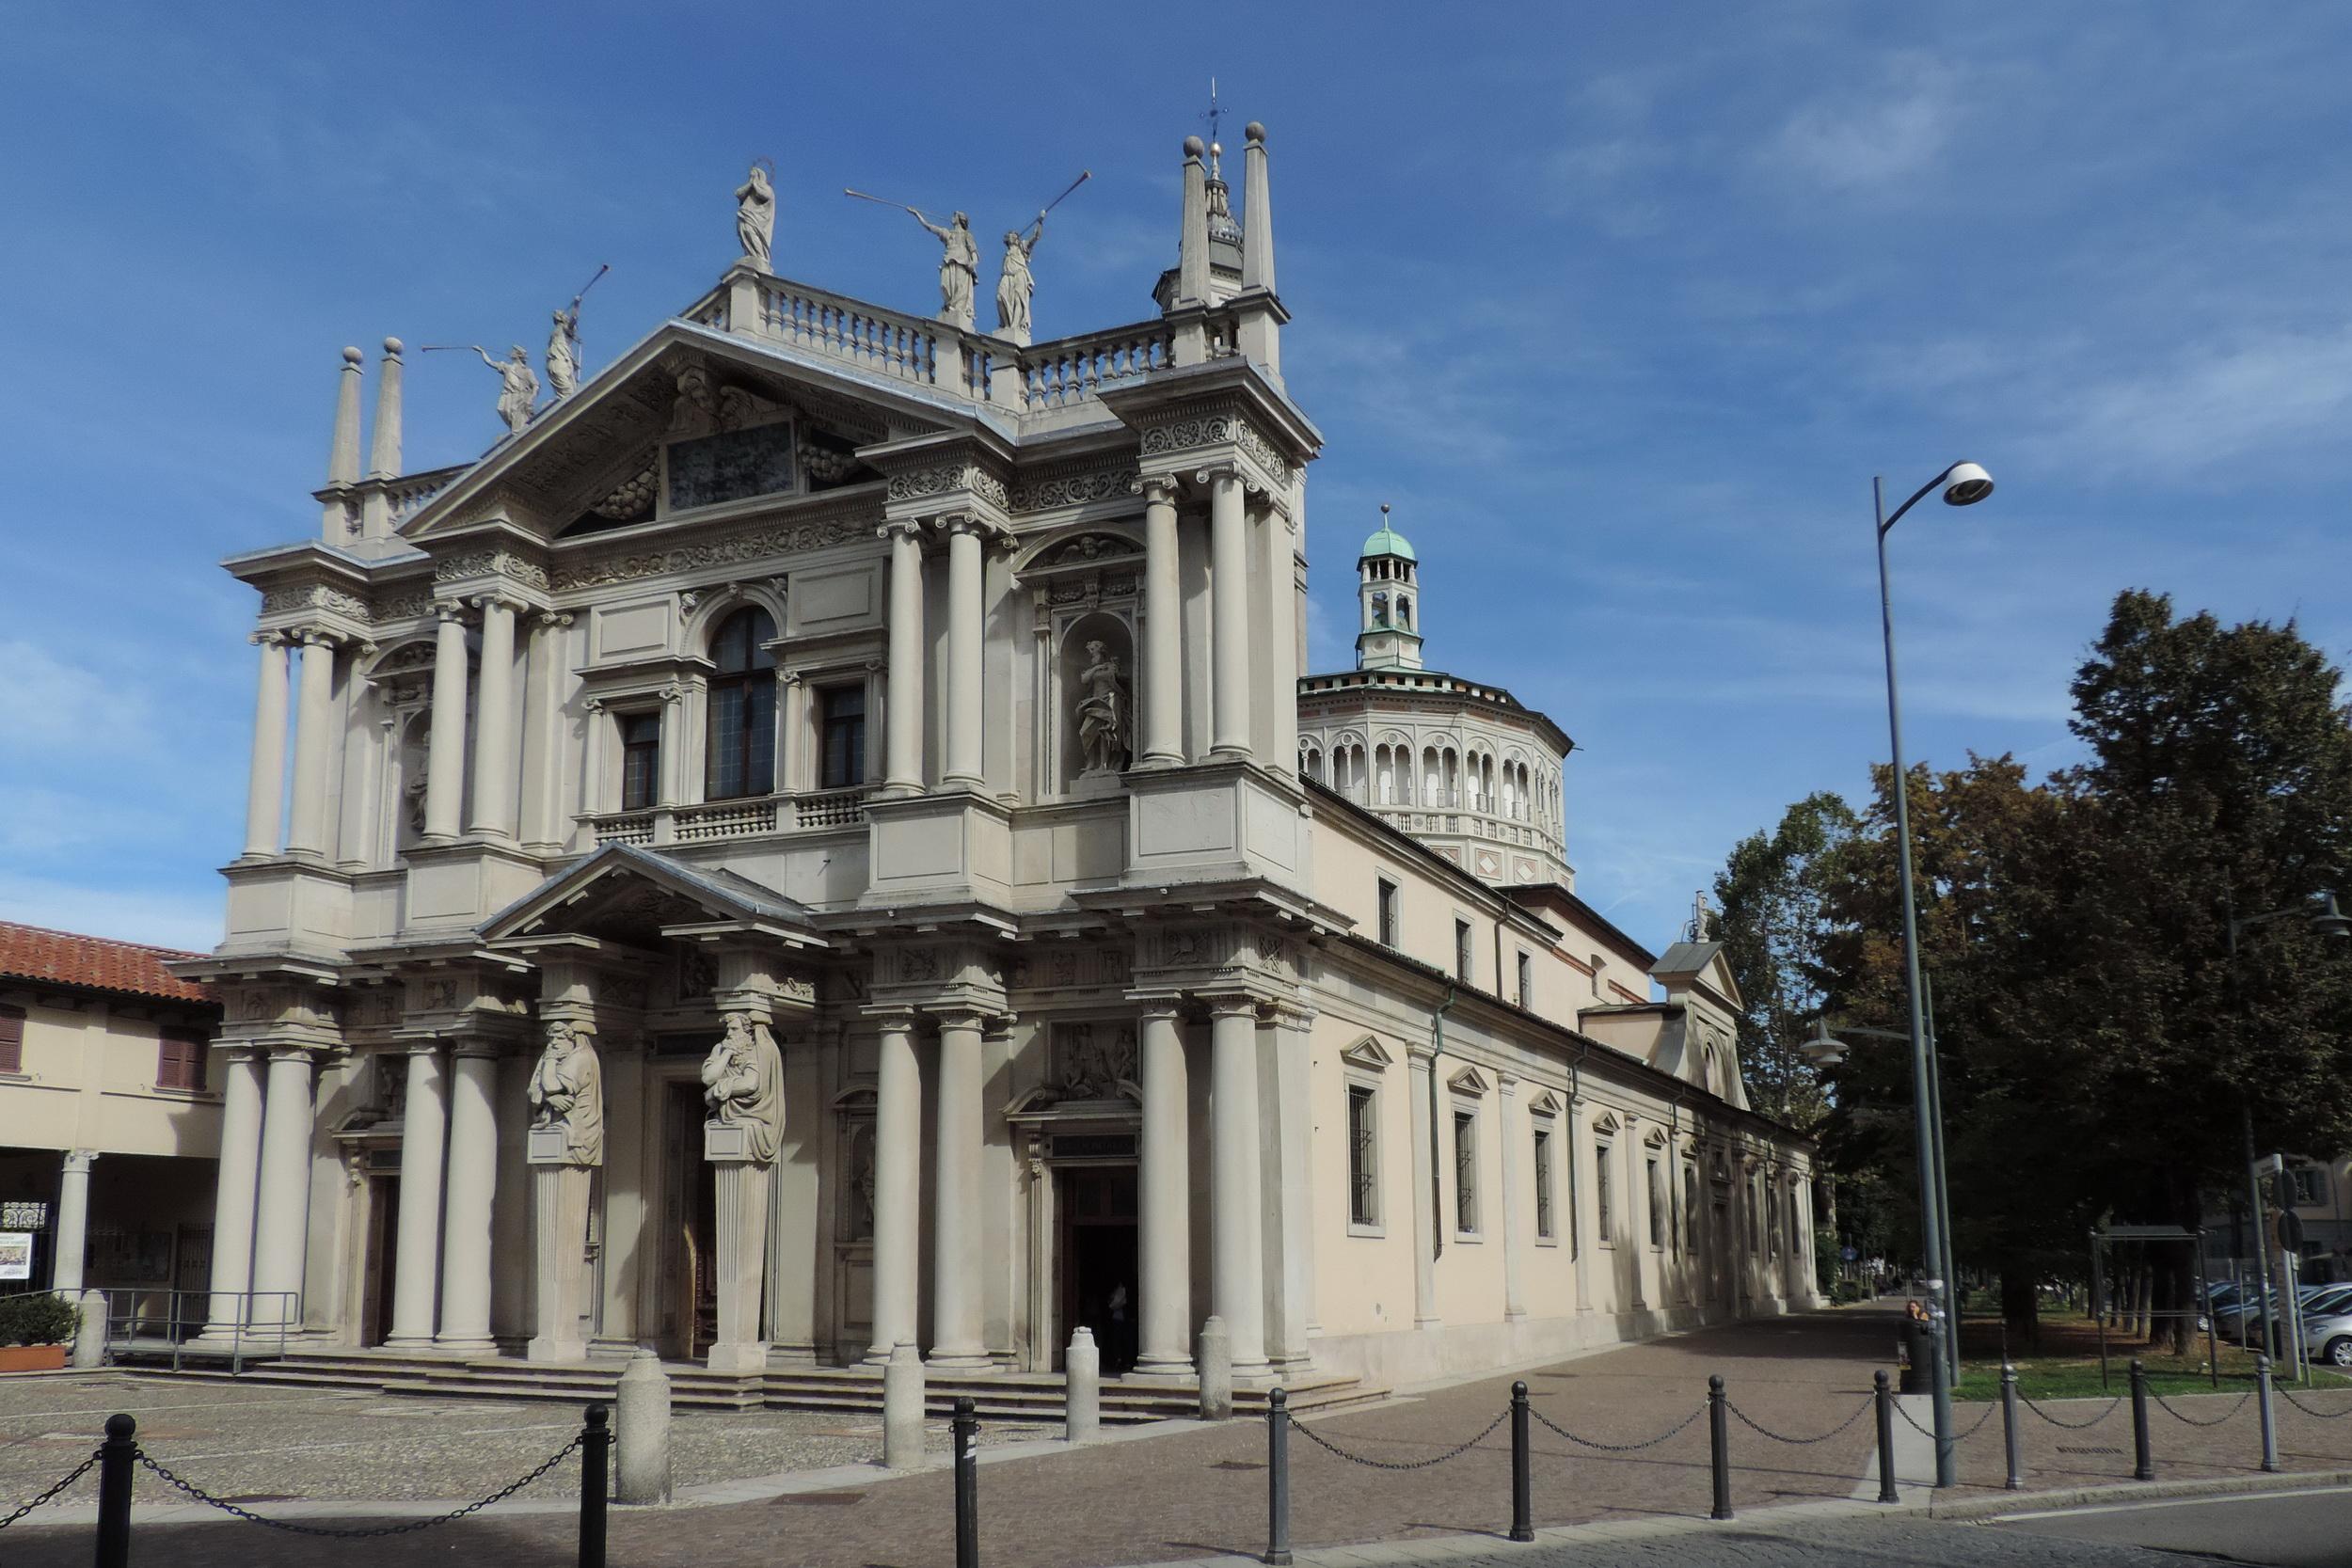 Saronno Italy  city photos : Description Saronno, Santuario della Beata Vergine dei Miracoli 01